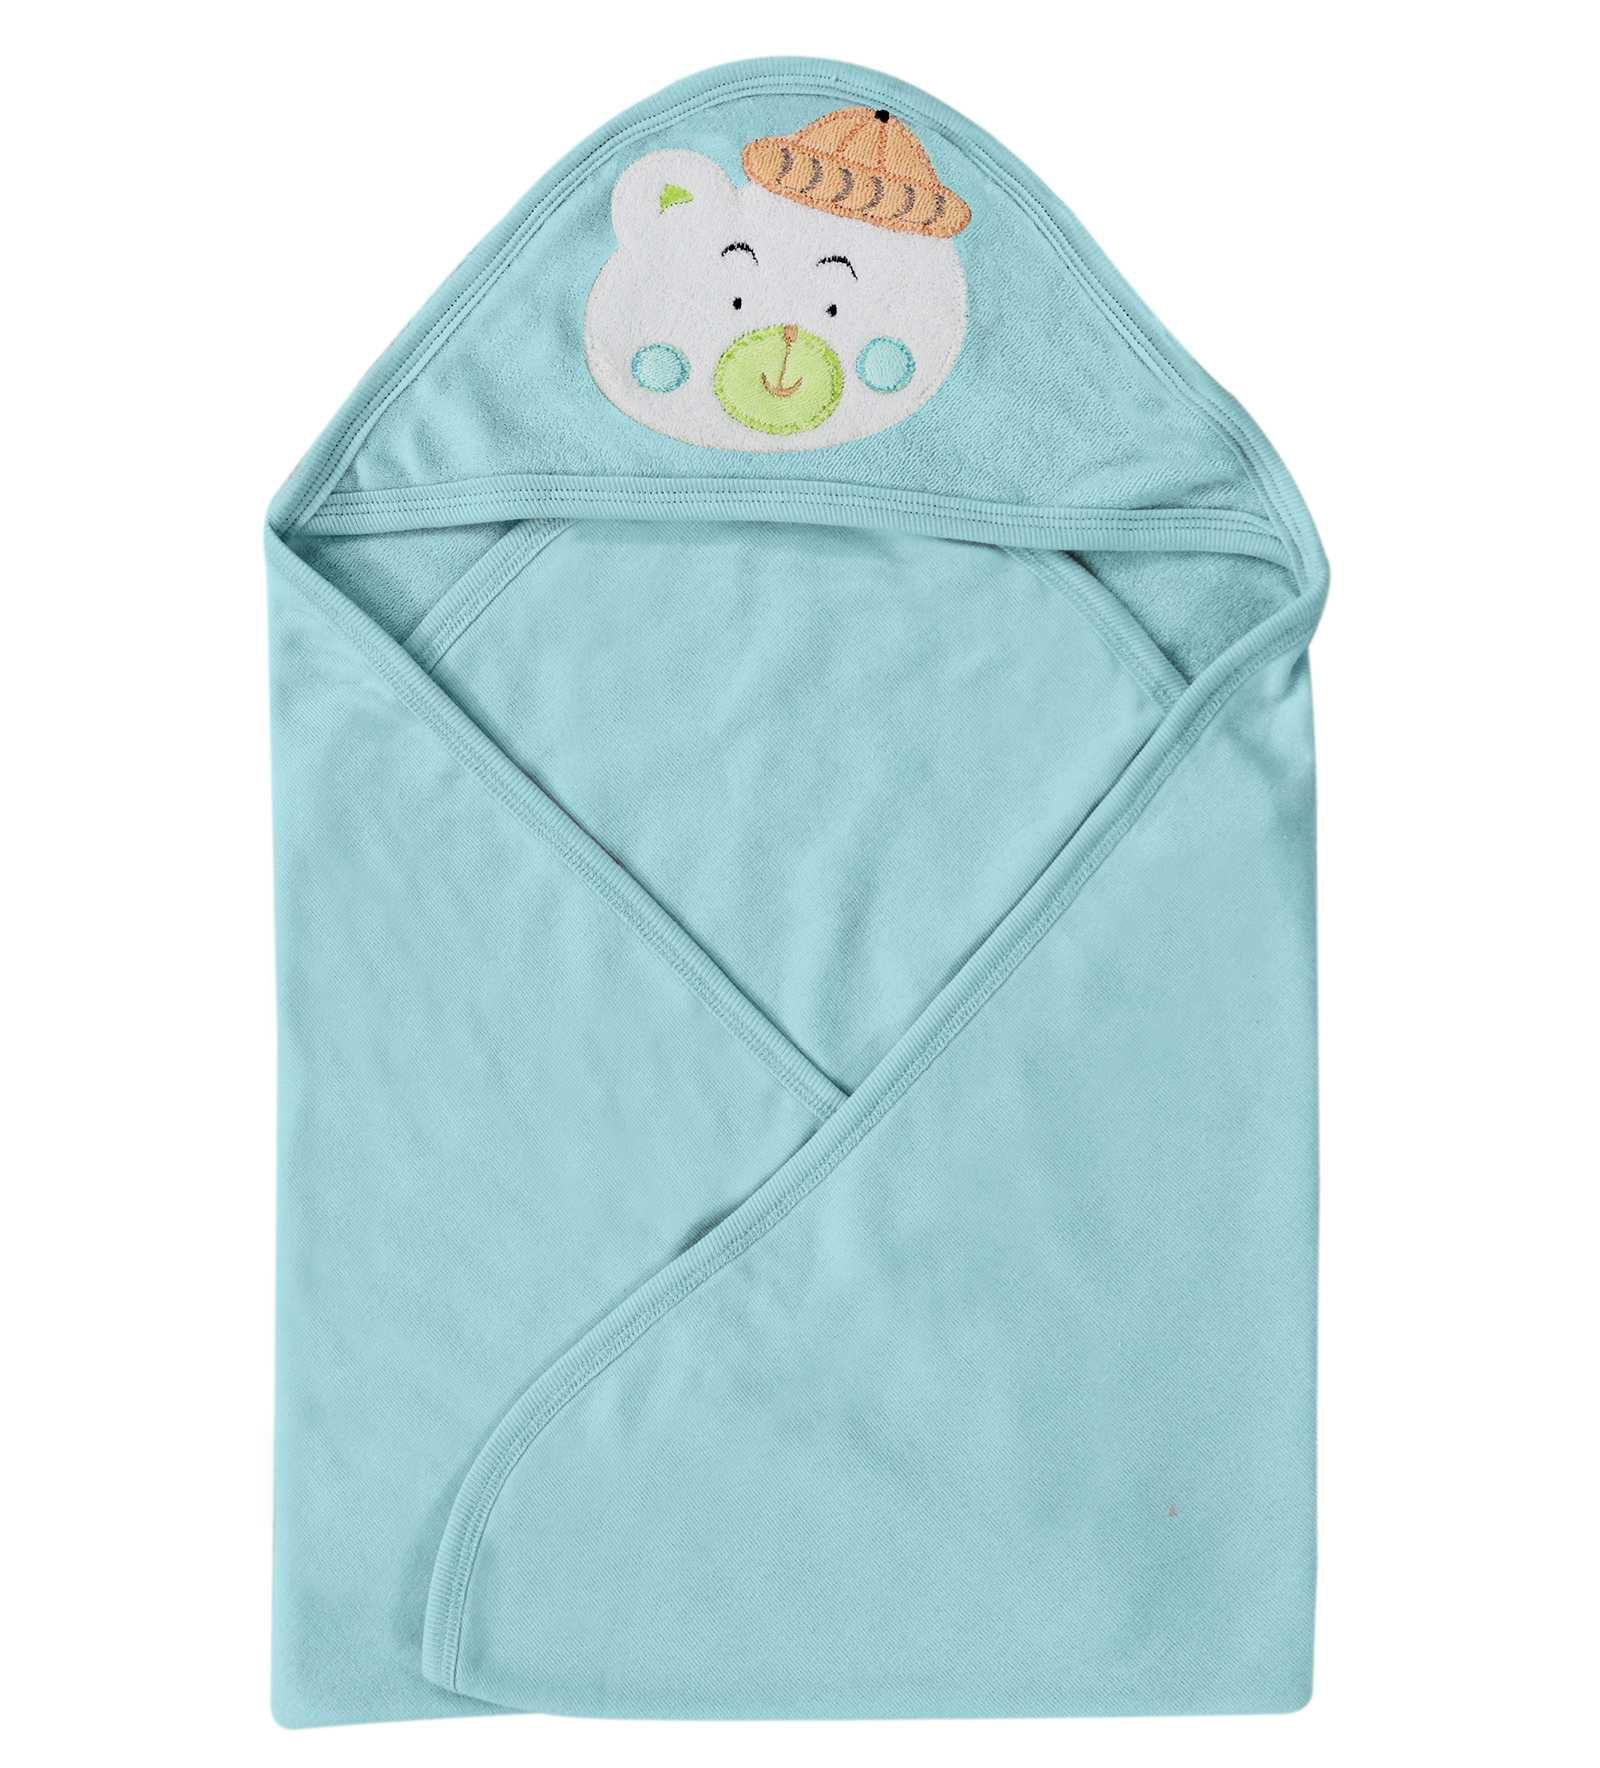 Tumble Multi Others Bath Towels